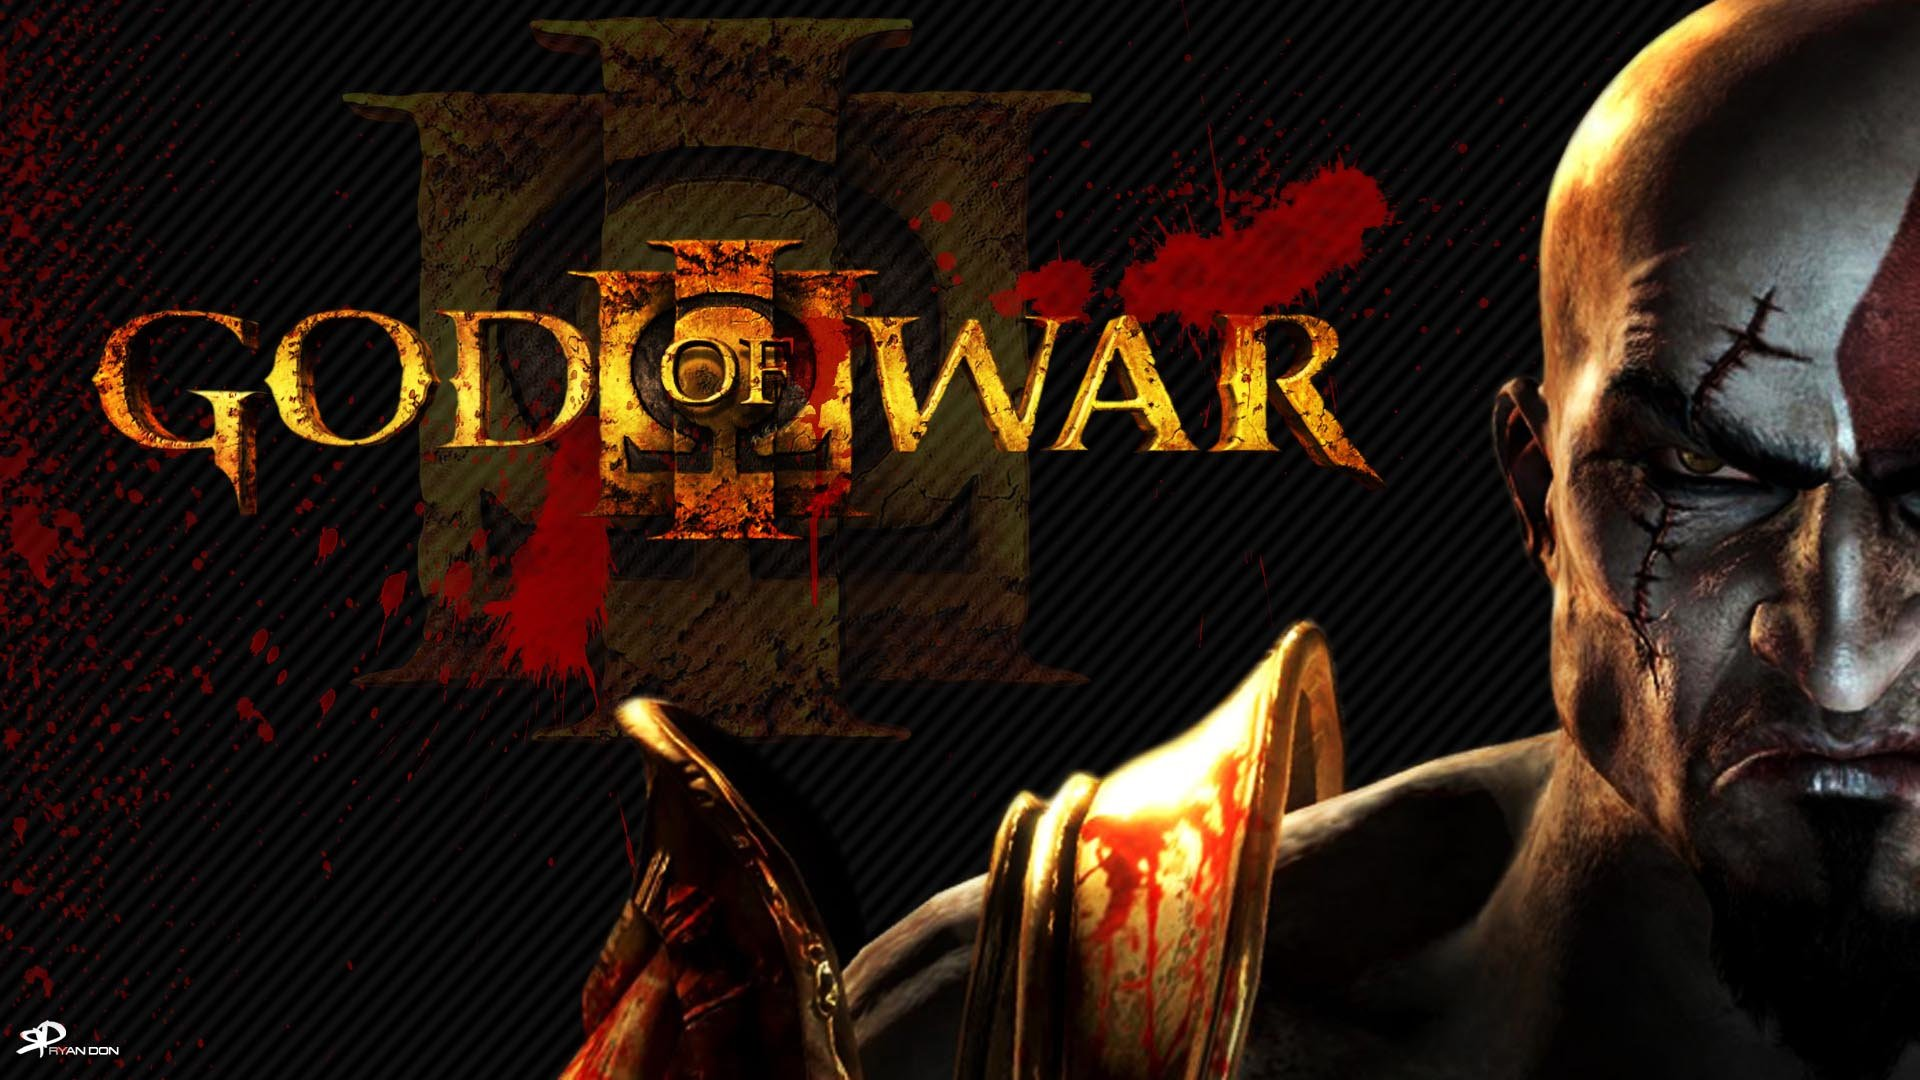 download god of war 3 pc game